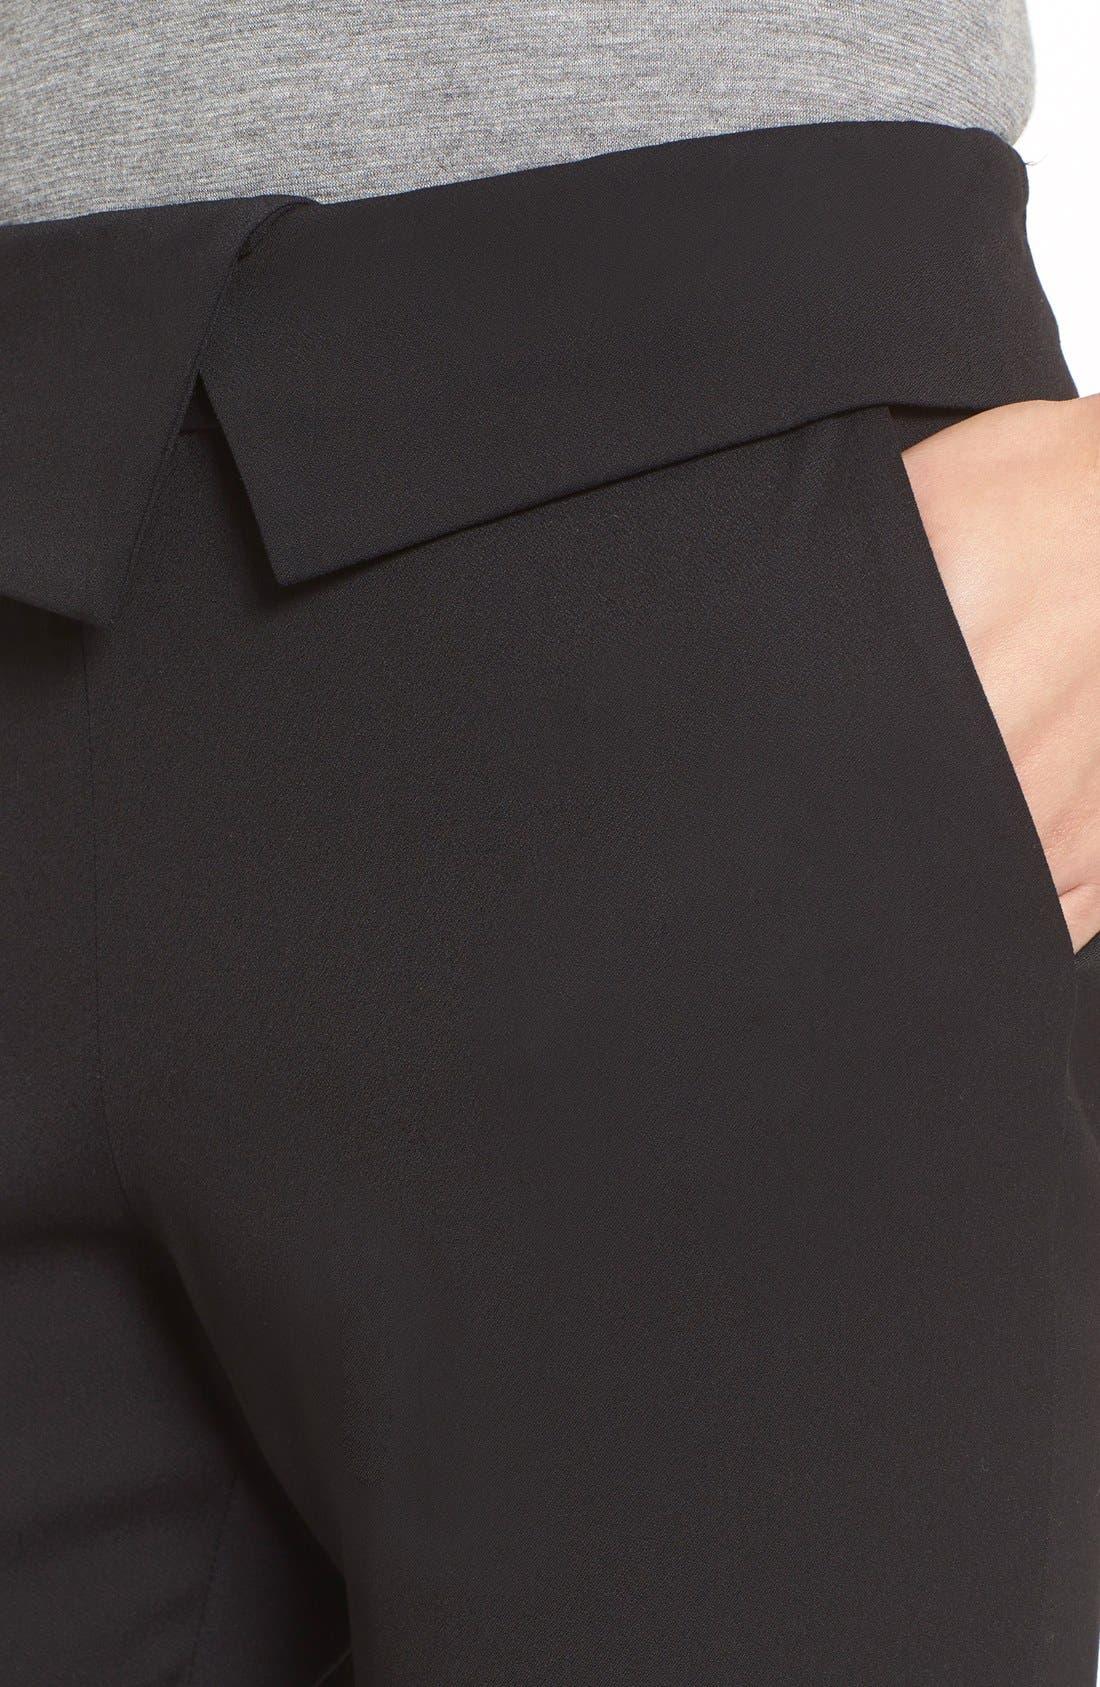 'Delray' Foldover Trousers,                             Alternate thumbnail 5, color,